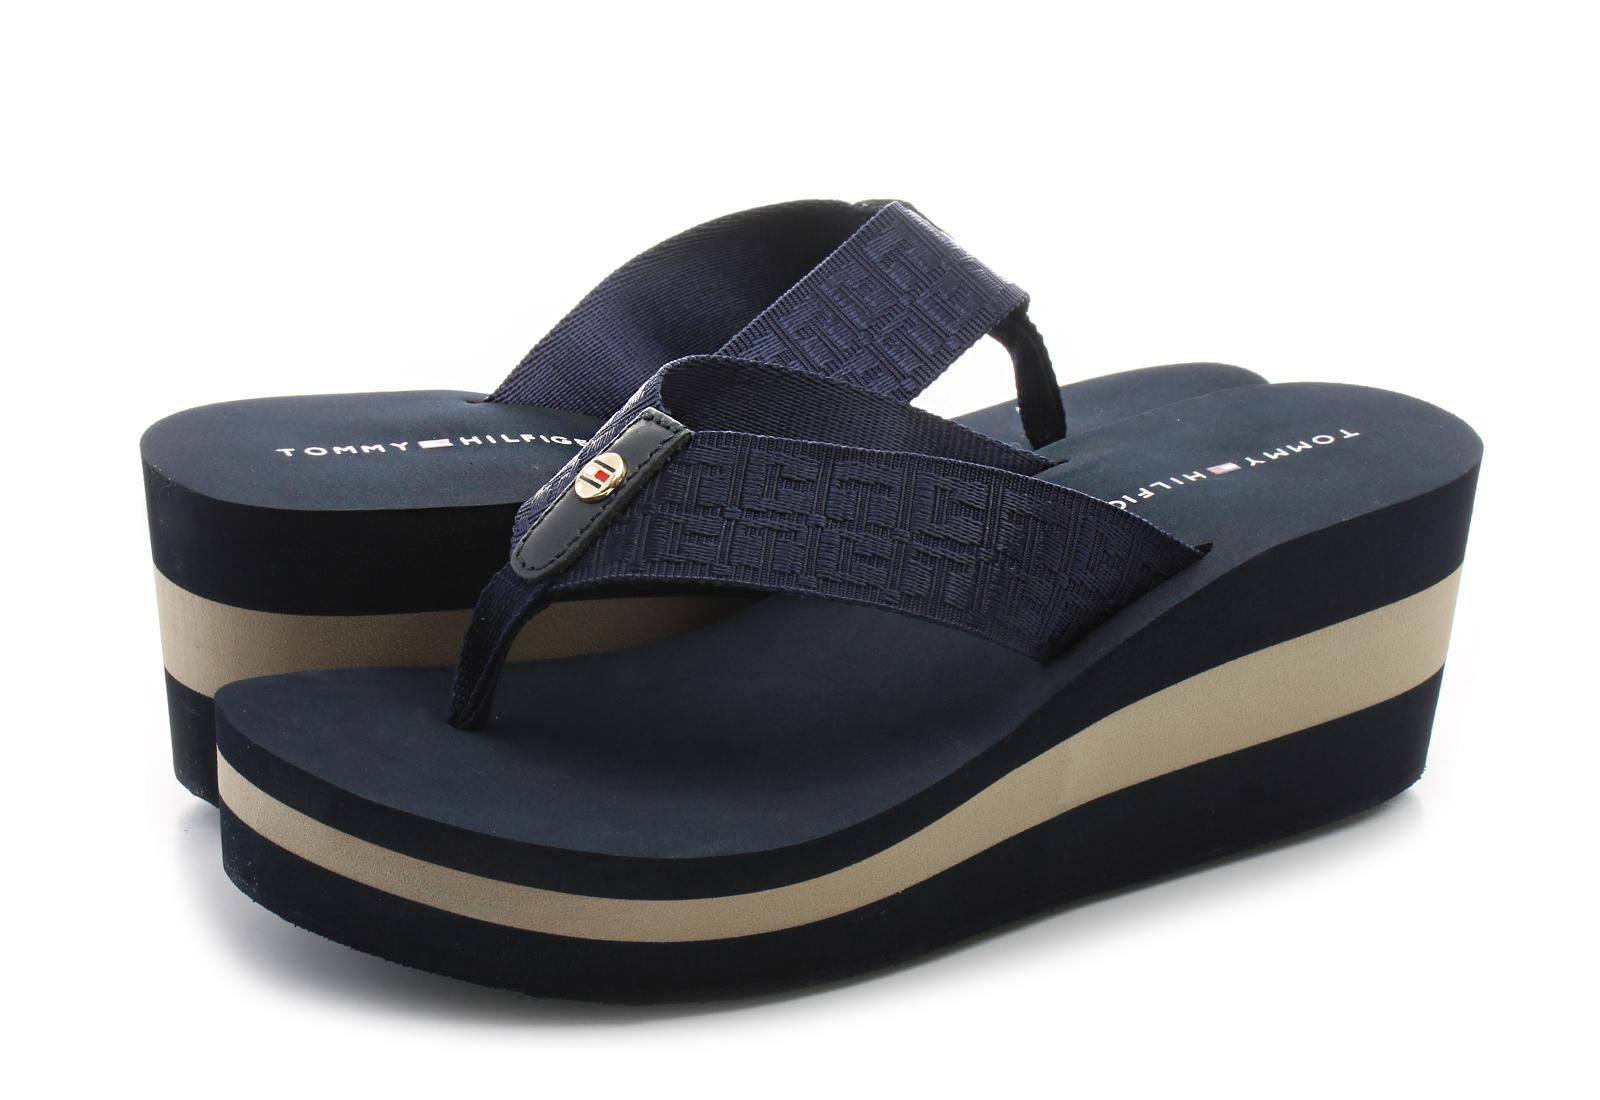 Tommy Hilfiger Papucs - Mariah 8 - 18S-2383-403 - Office Shoes ... e464b9f6c4